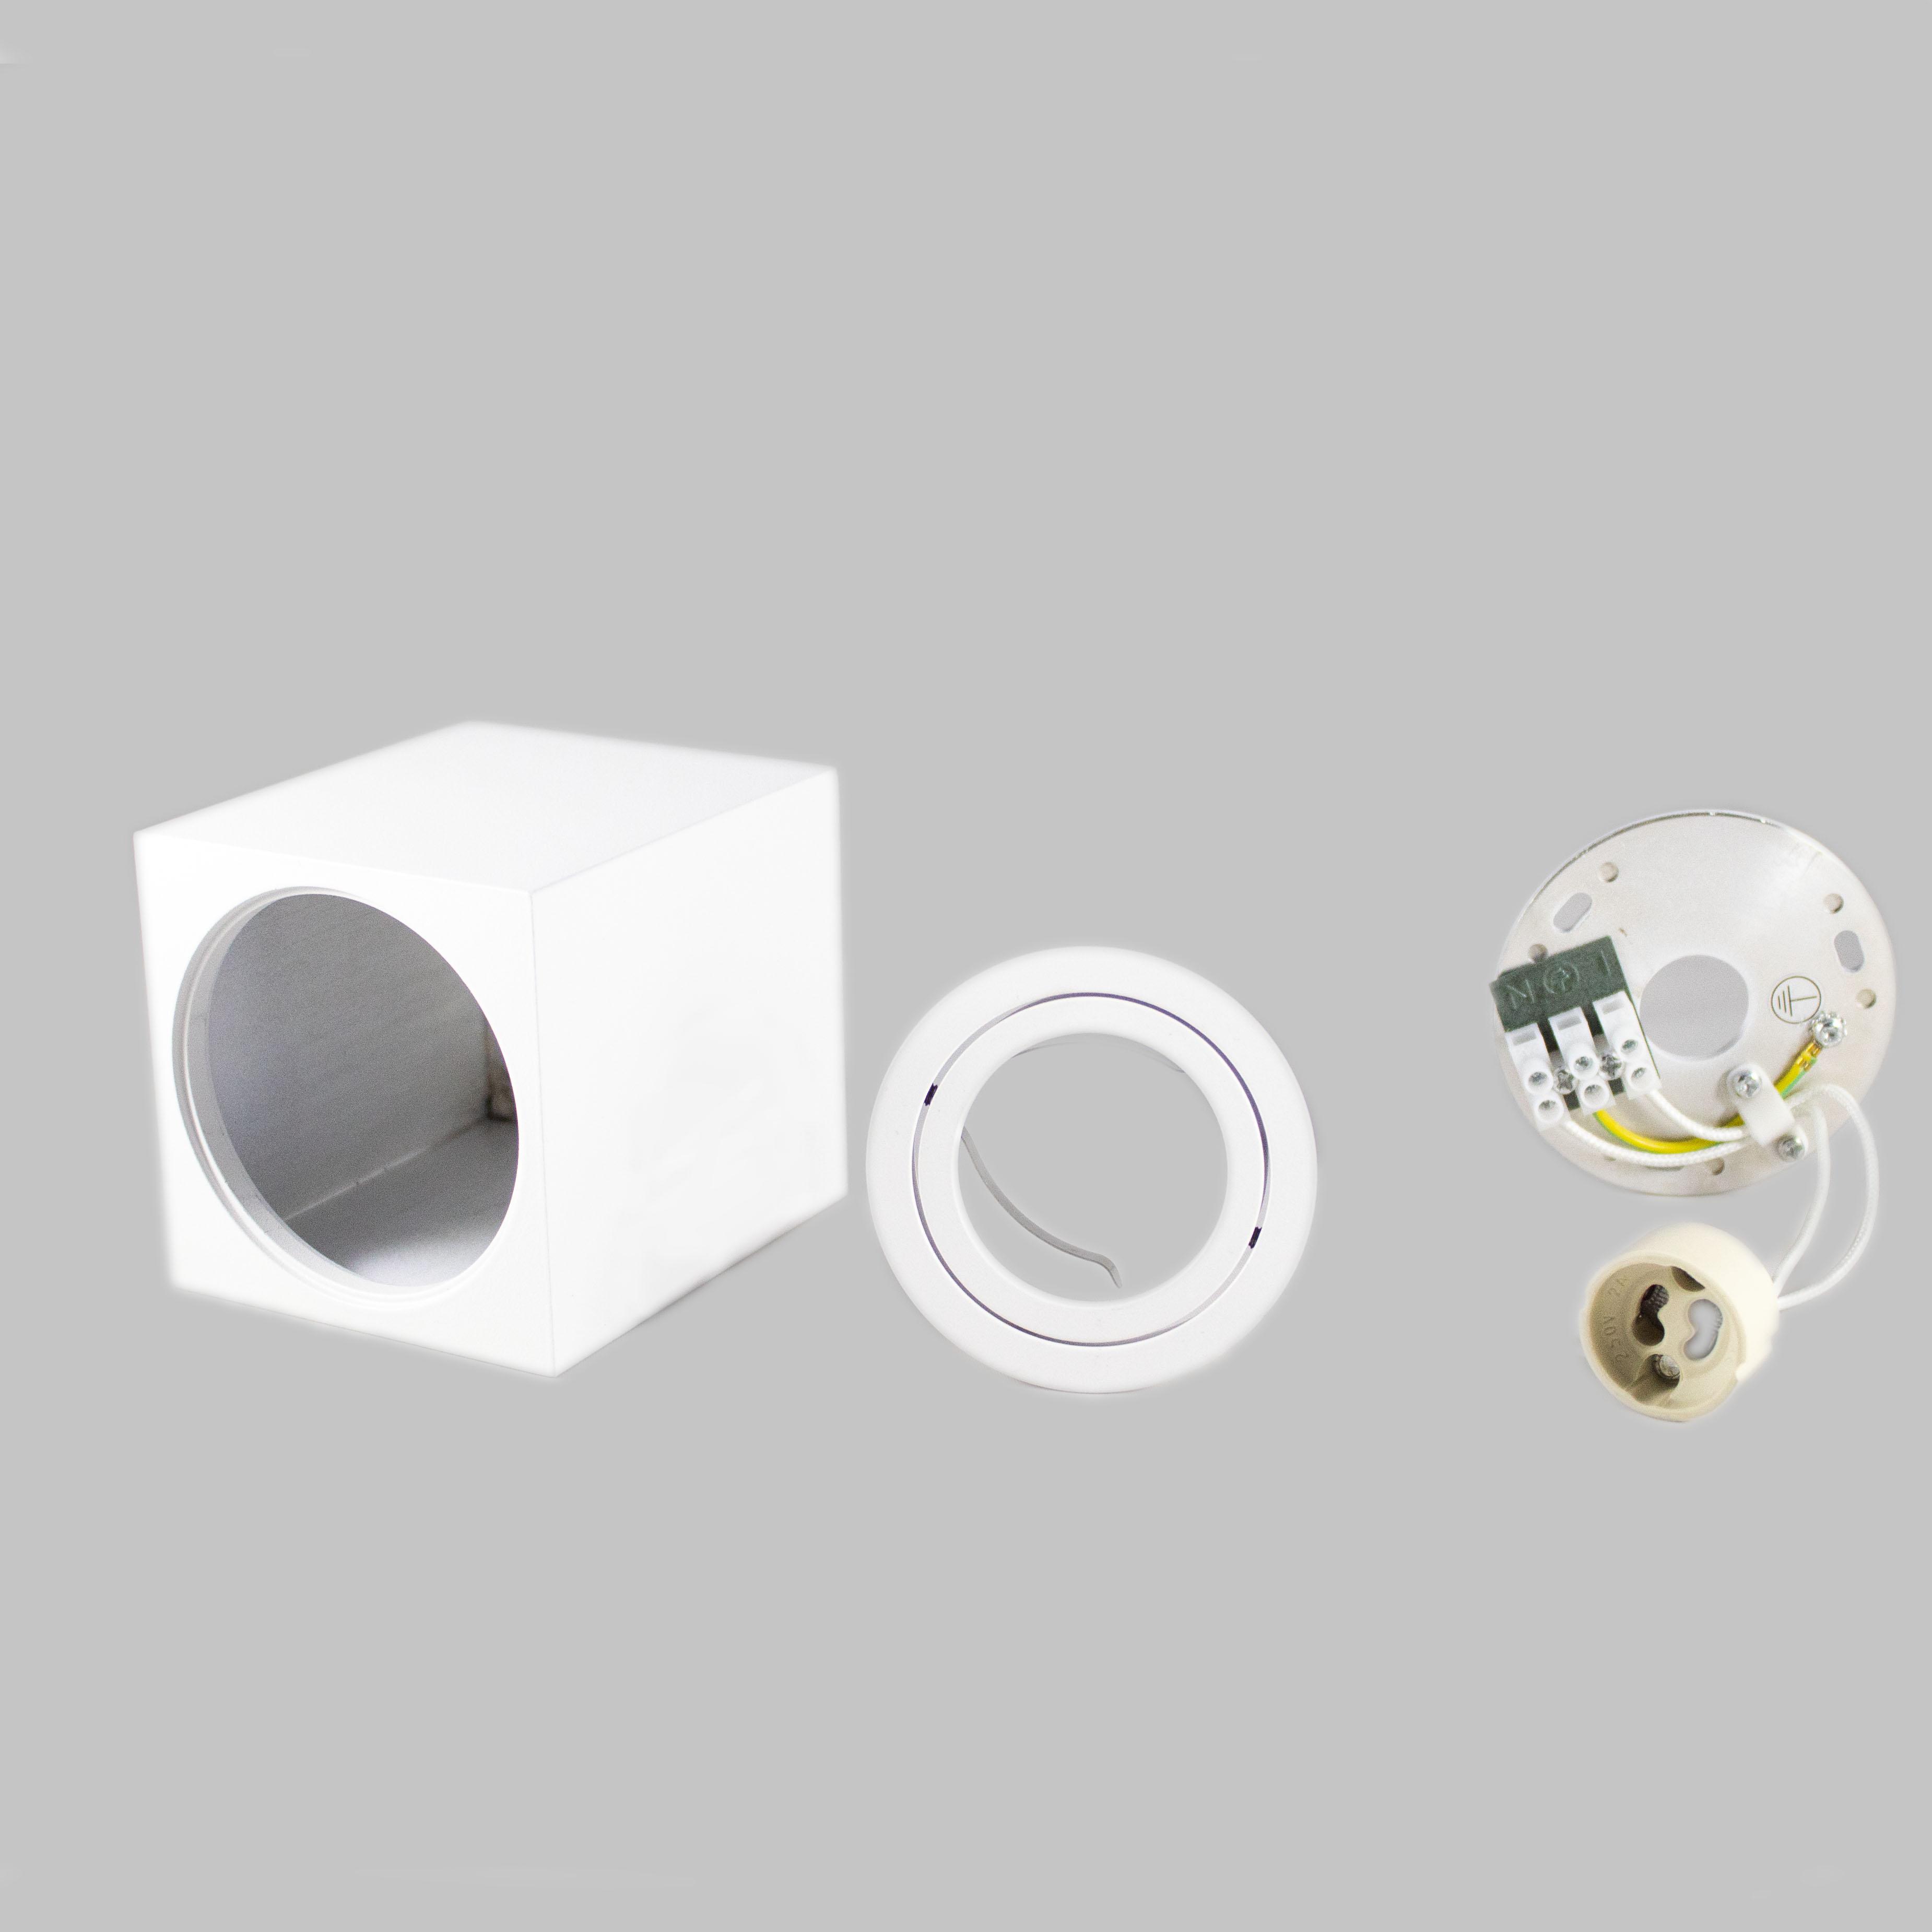 Opbouw spot armatuur wit vierkant kantelbaar GU10 fitting - onderdelen bundel